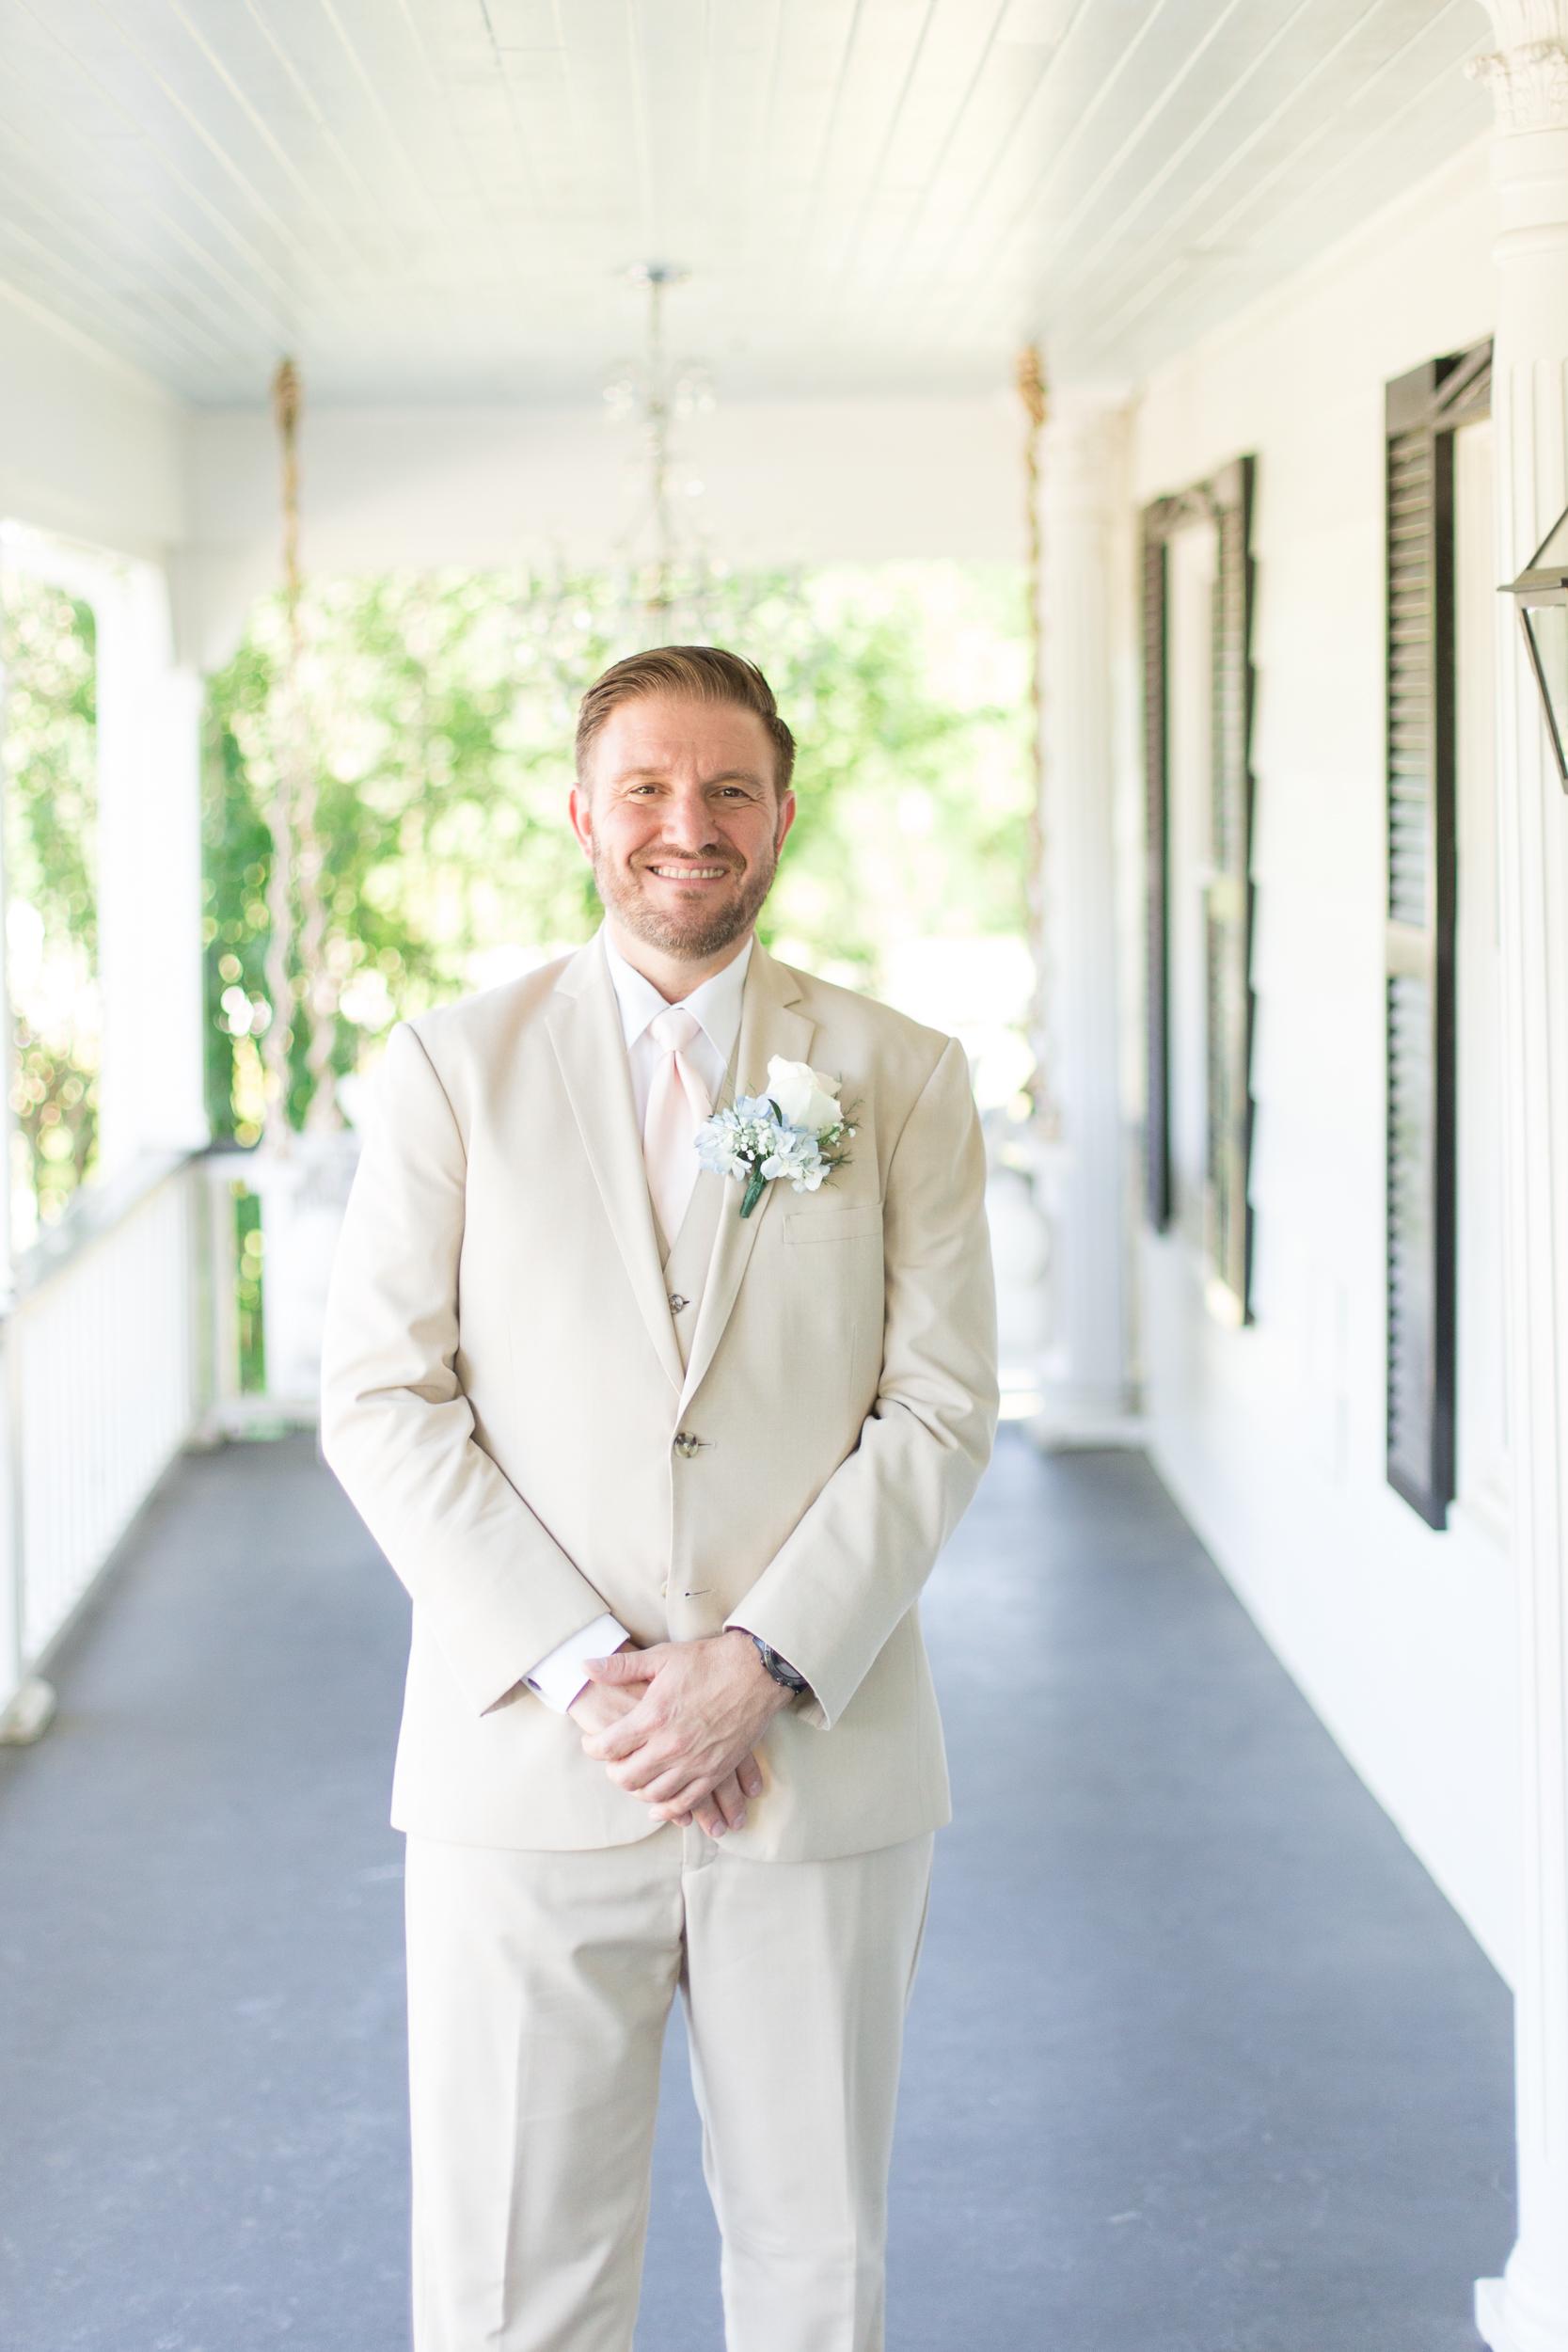 Zihlman-East TX Wedding_Kelsie Hendricks Photography_The Folmar Tyler Texas-84.jpg